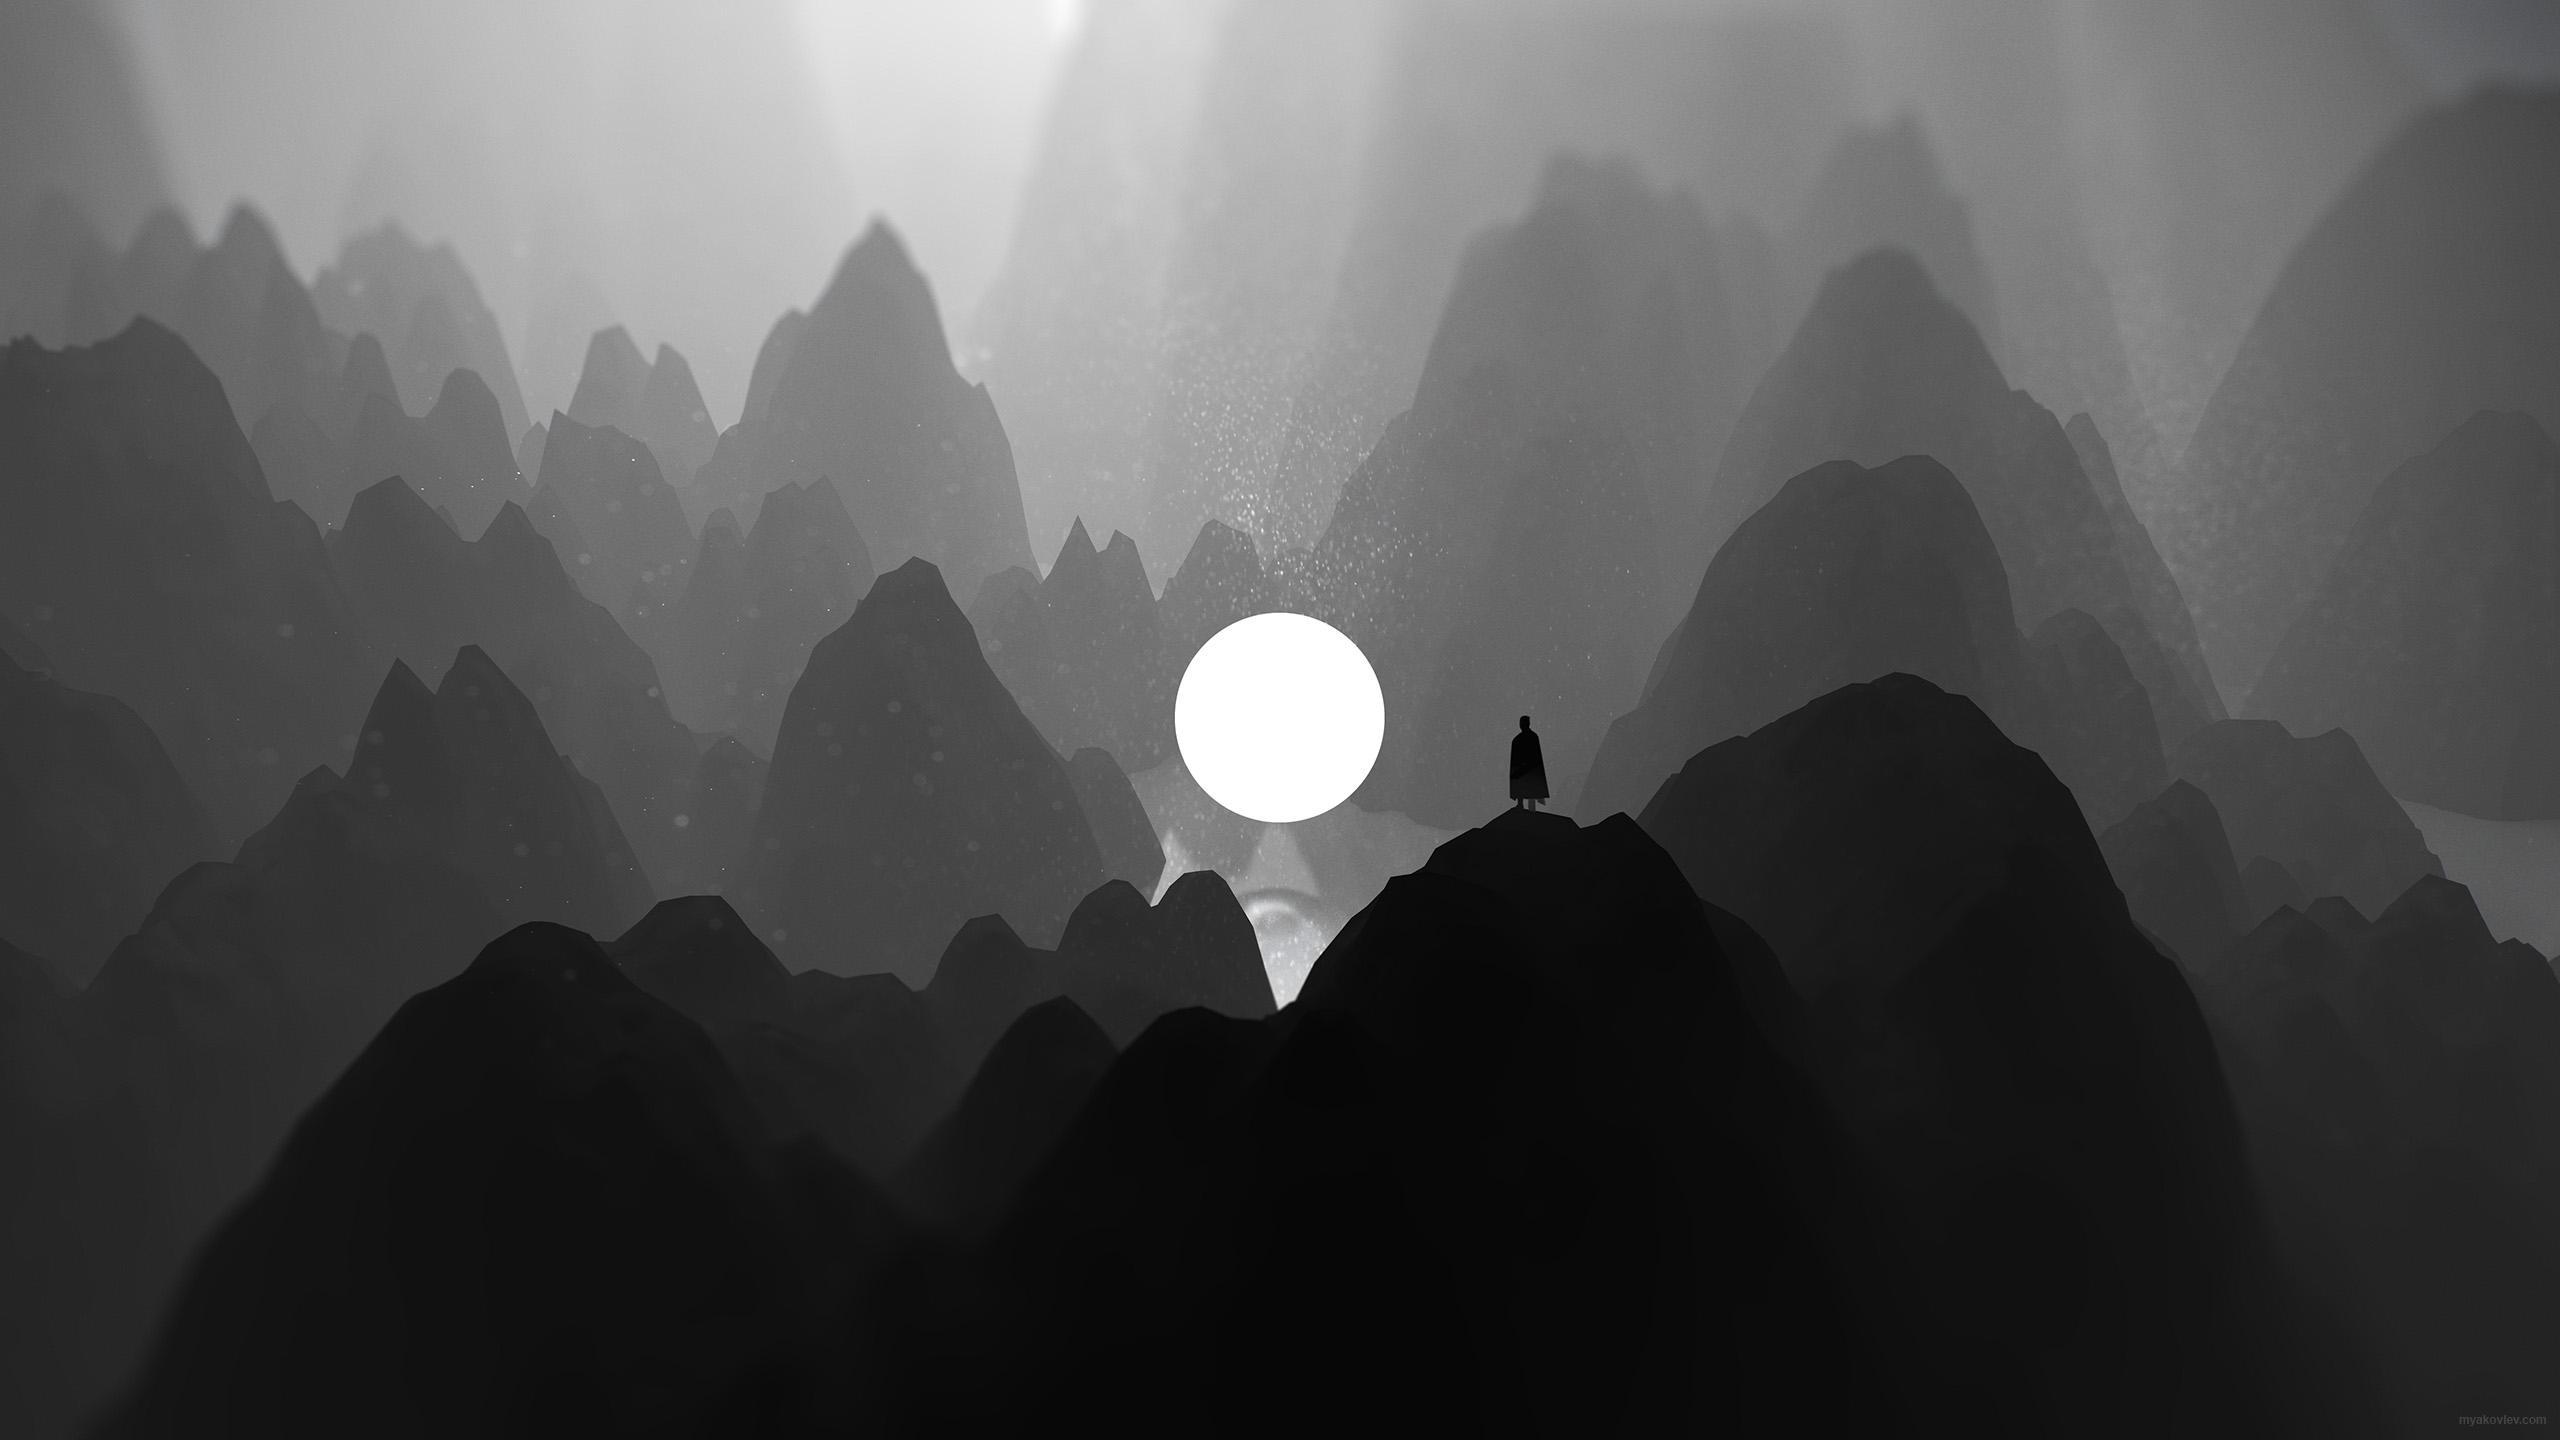 General 2560x1440 artwork digital art monochrome loneliness alone